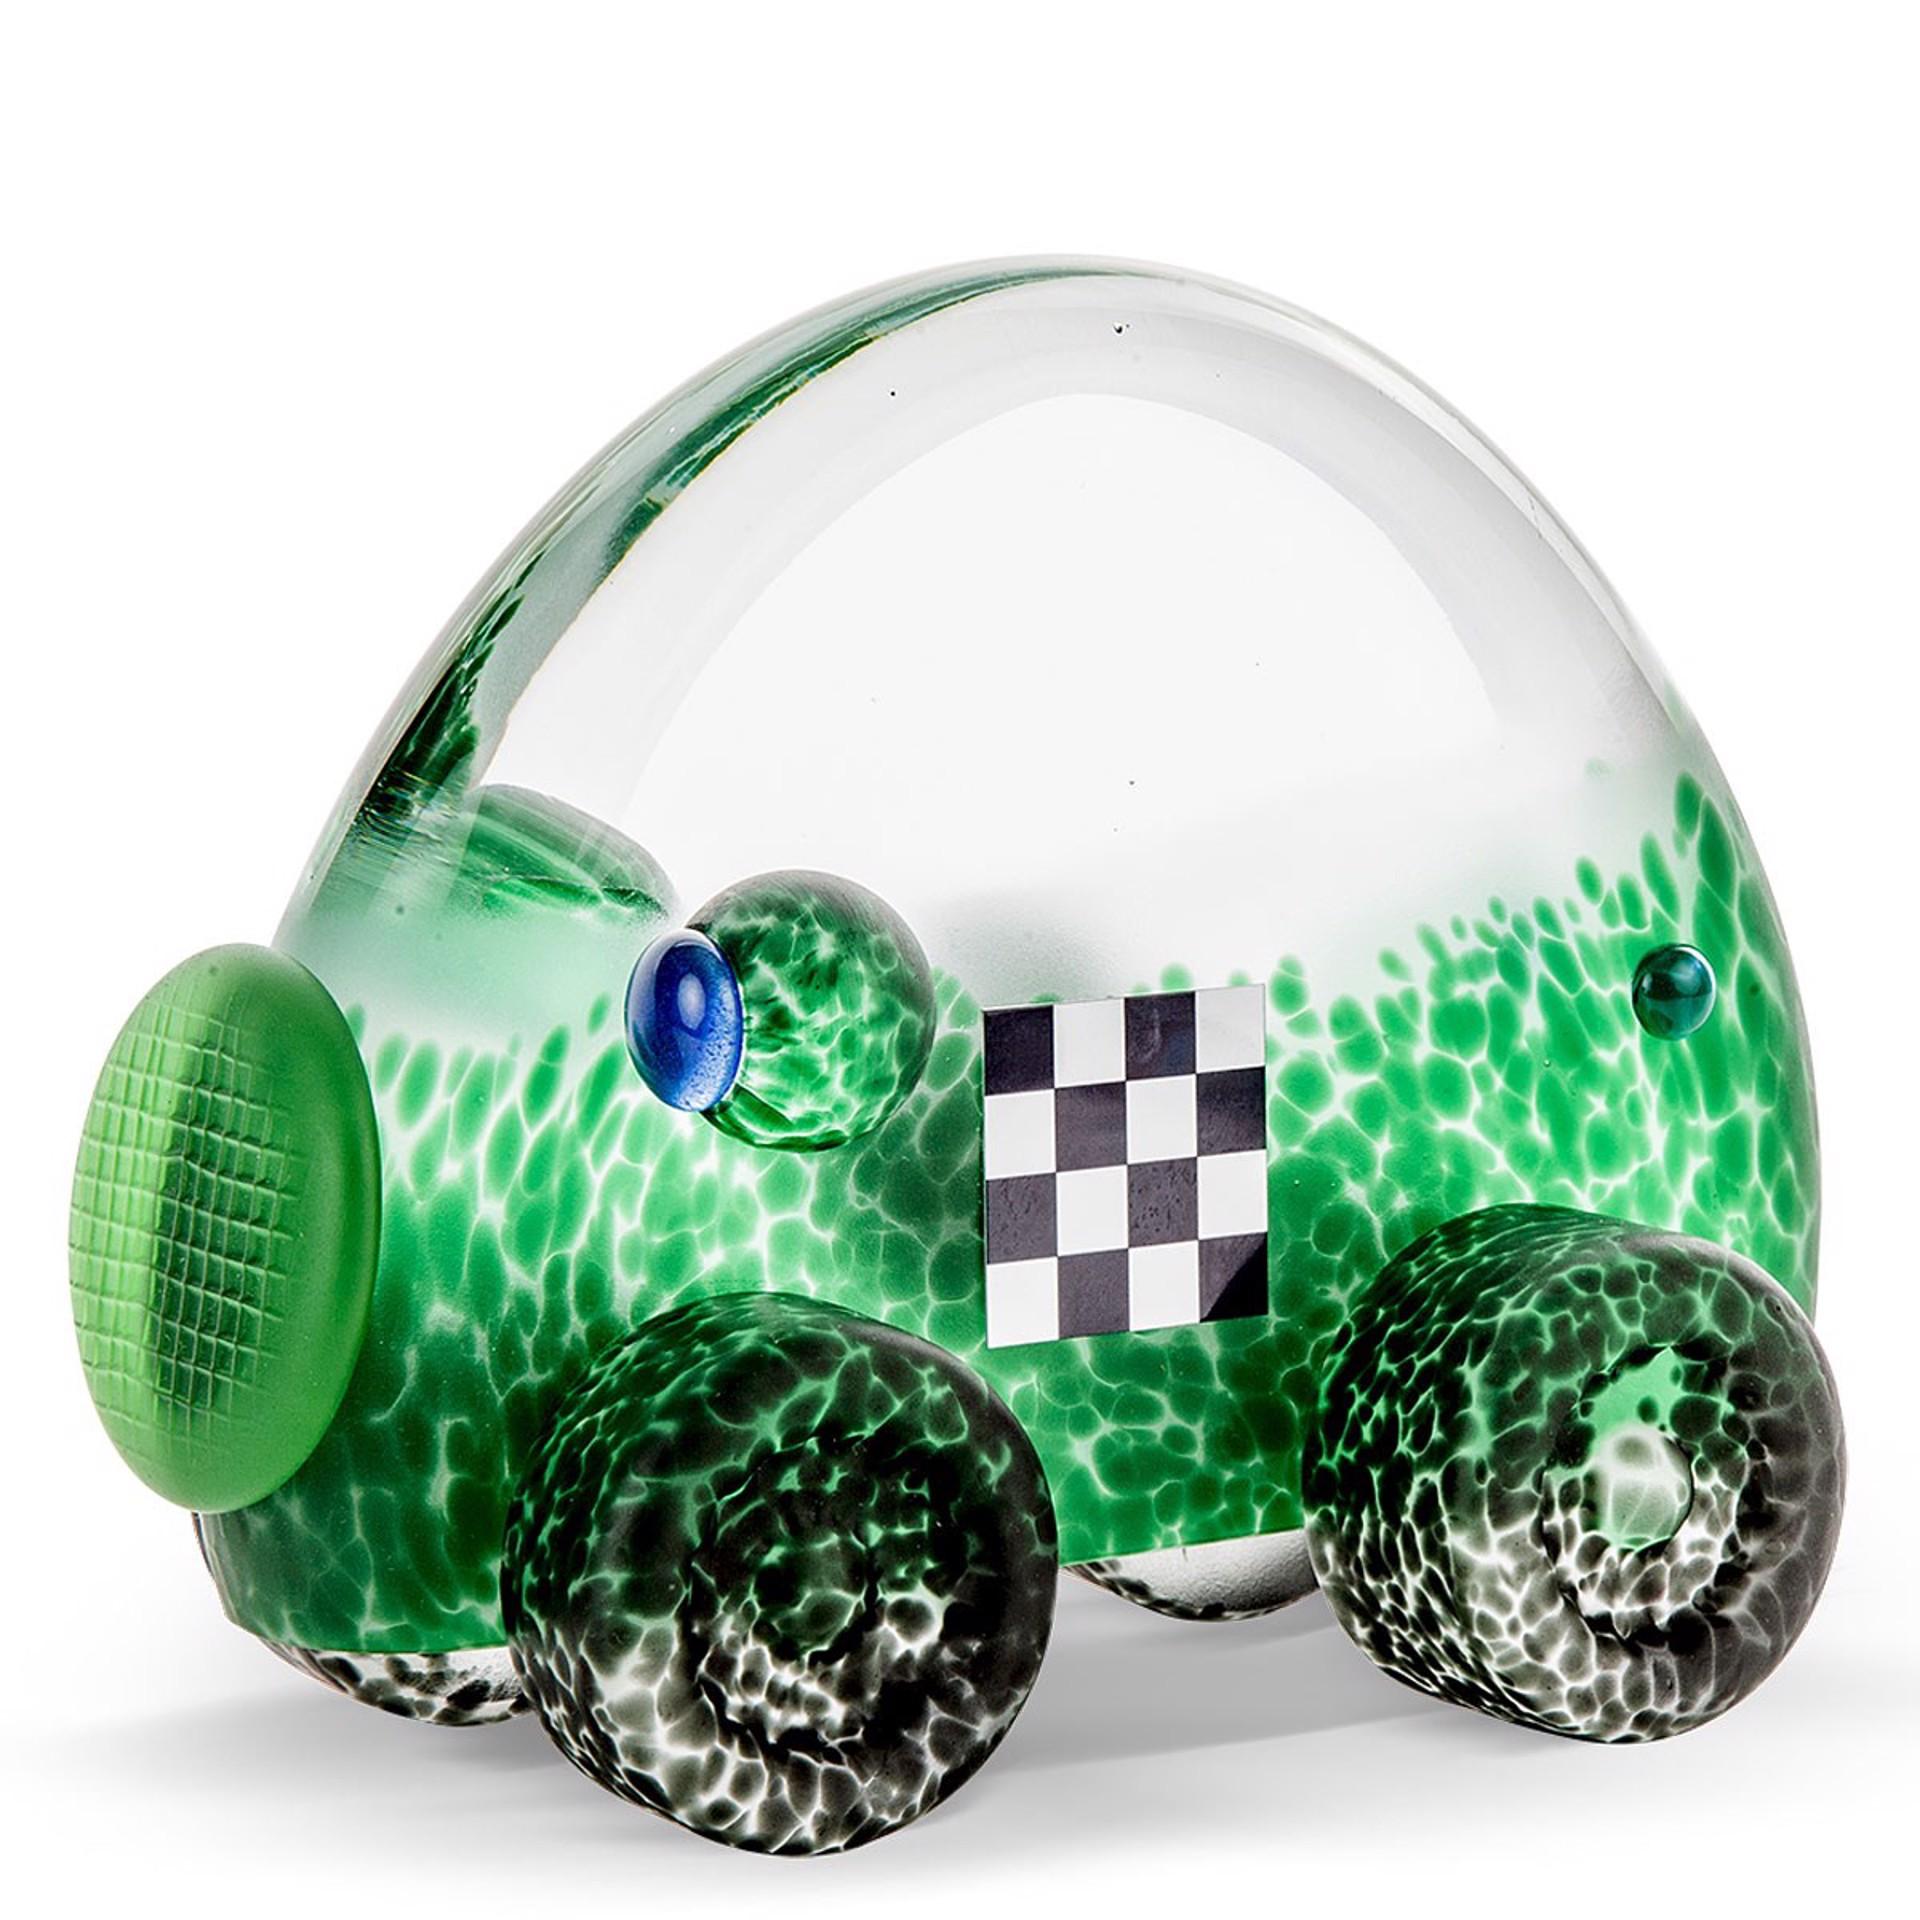 sST/ LOVE BUG, object, green by Borowski